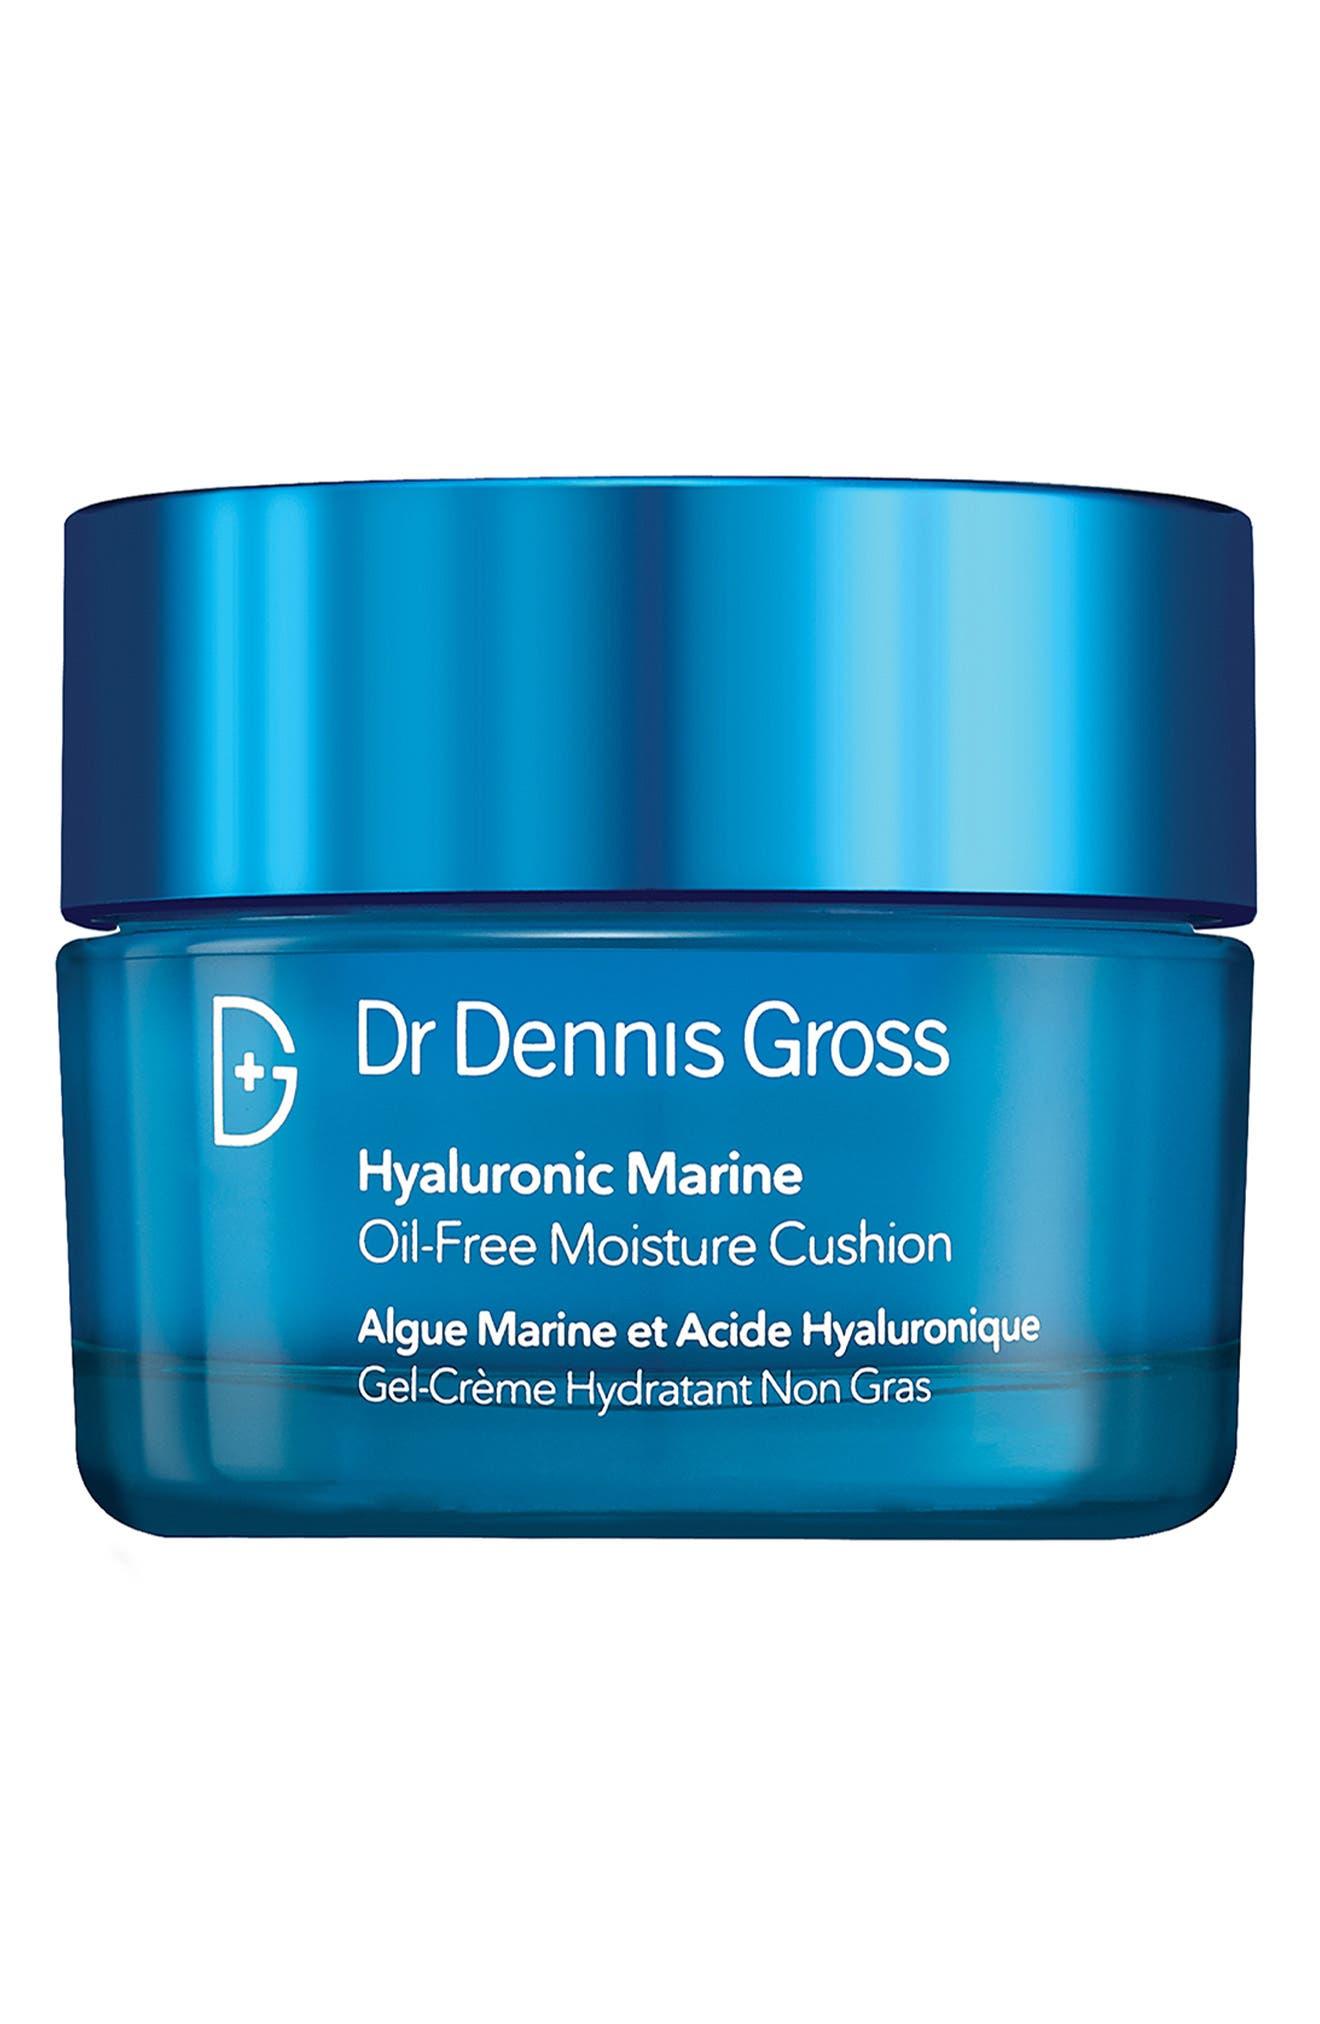 Skincare Hyaluronic Marine Oil-Free Moisture Cushion